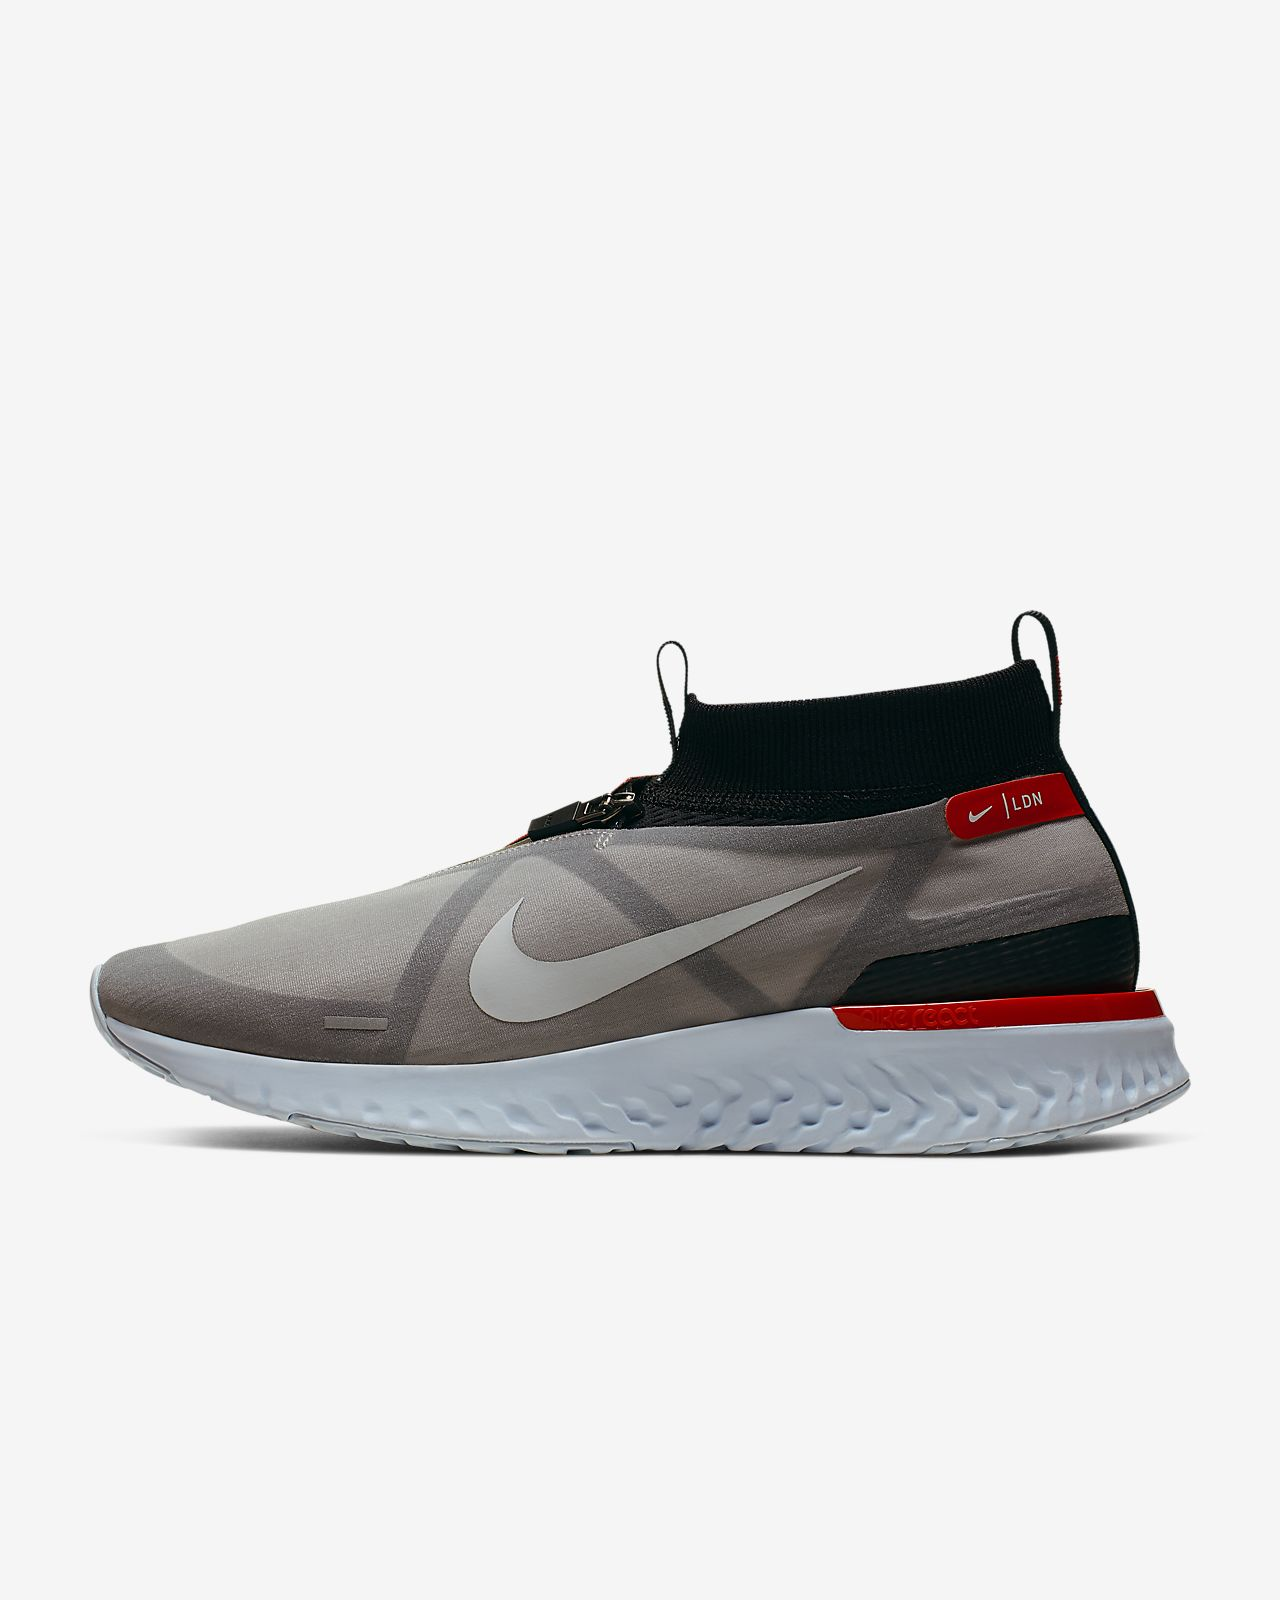 Chaussure de running Nike React City Premium pour Homme